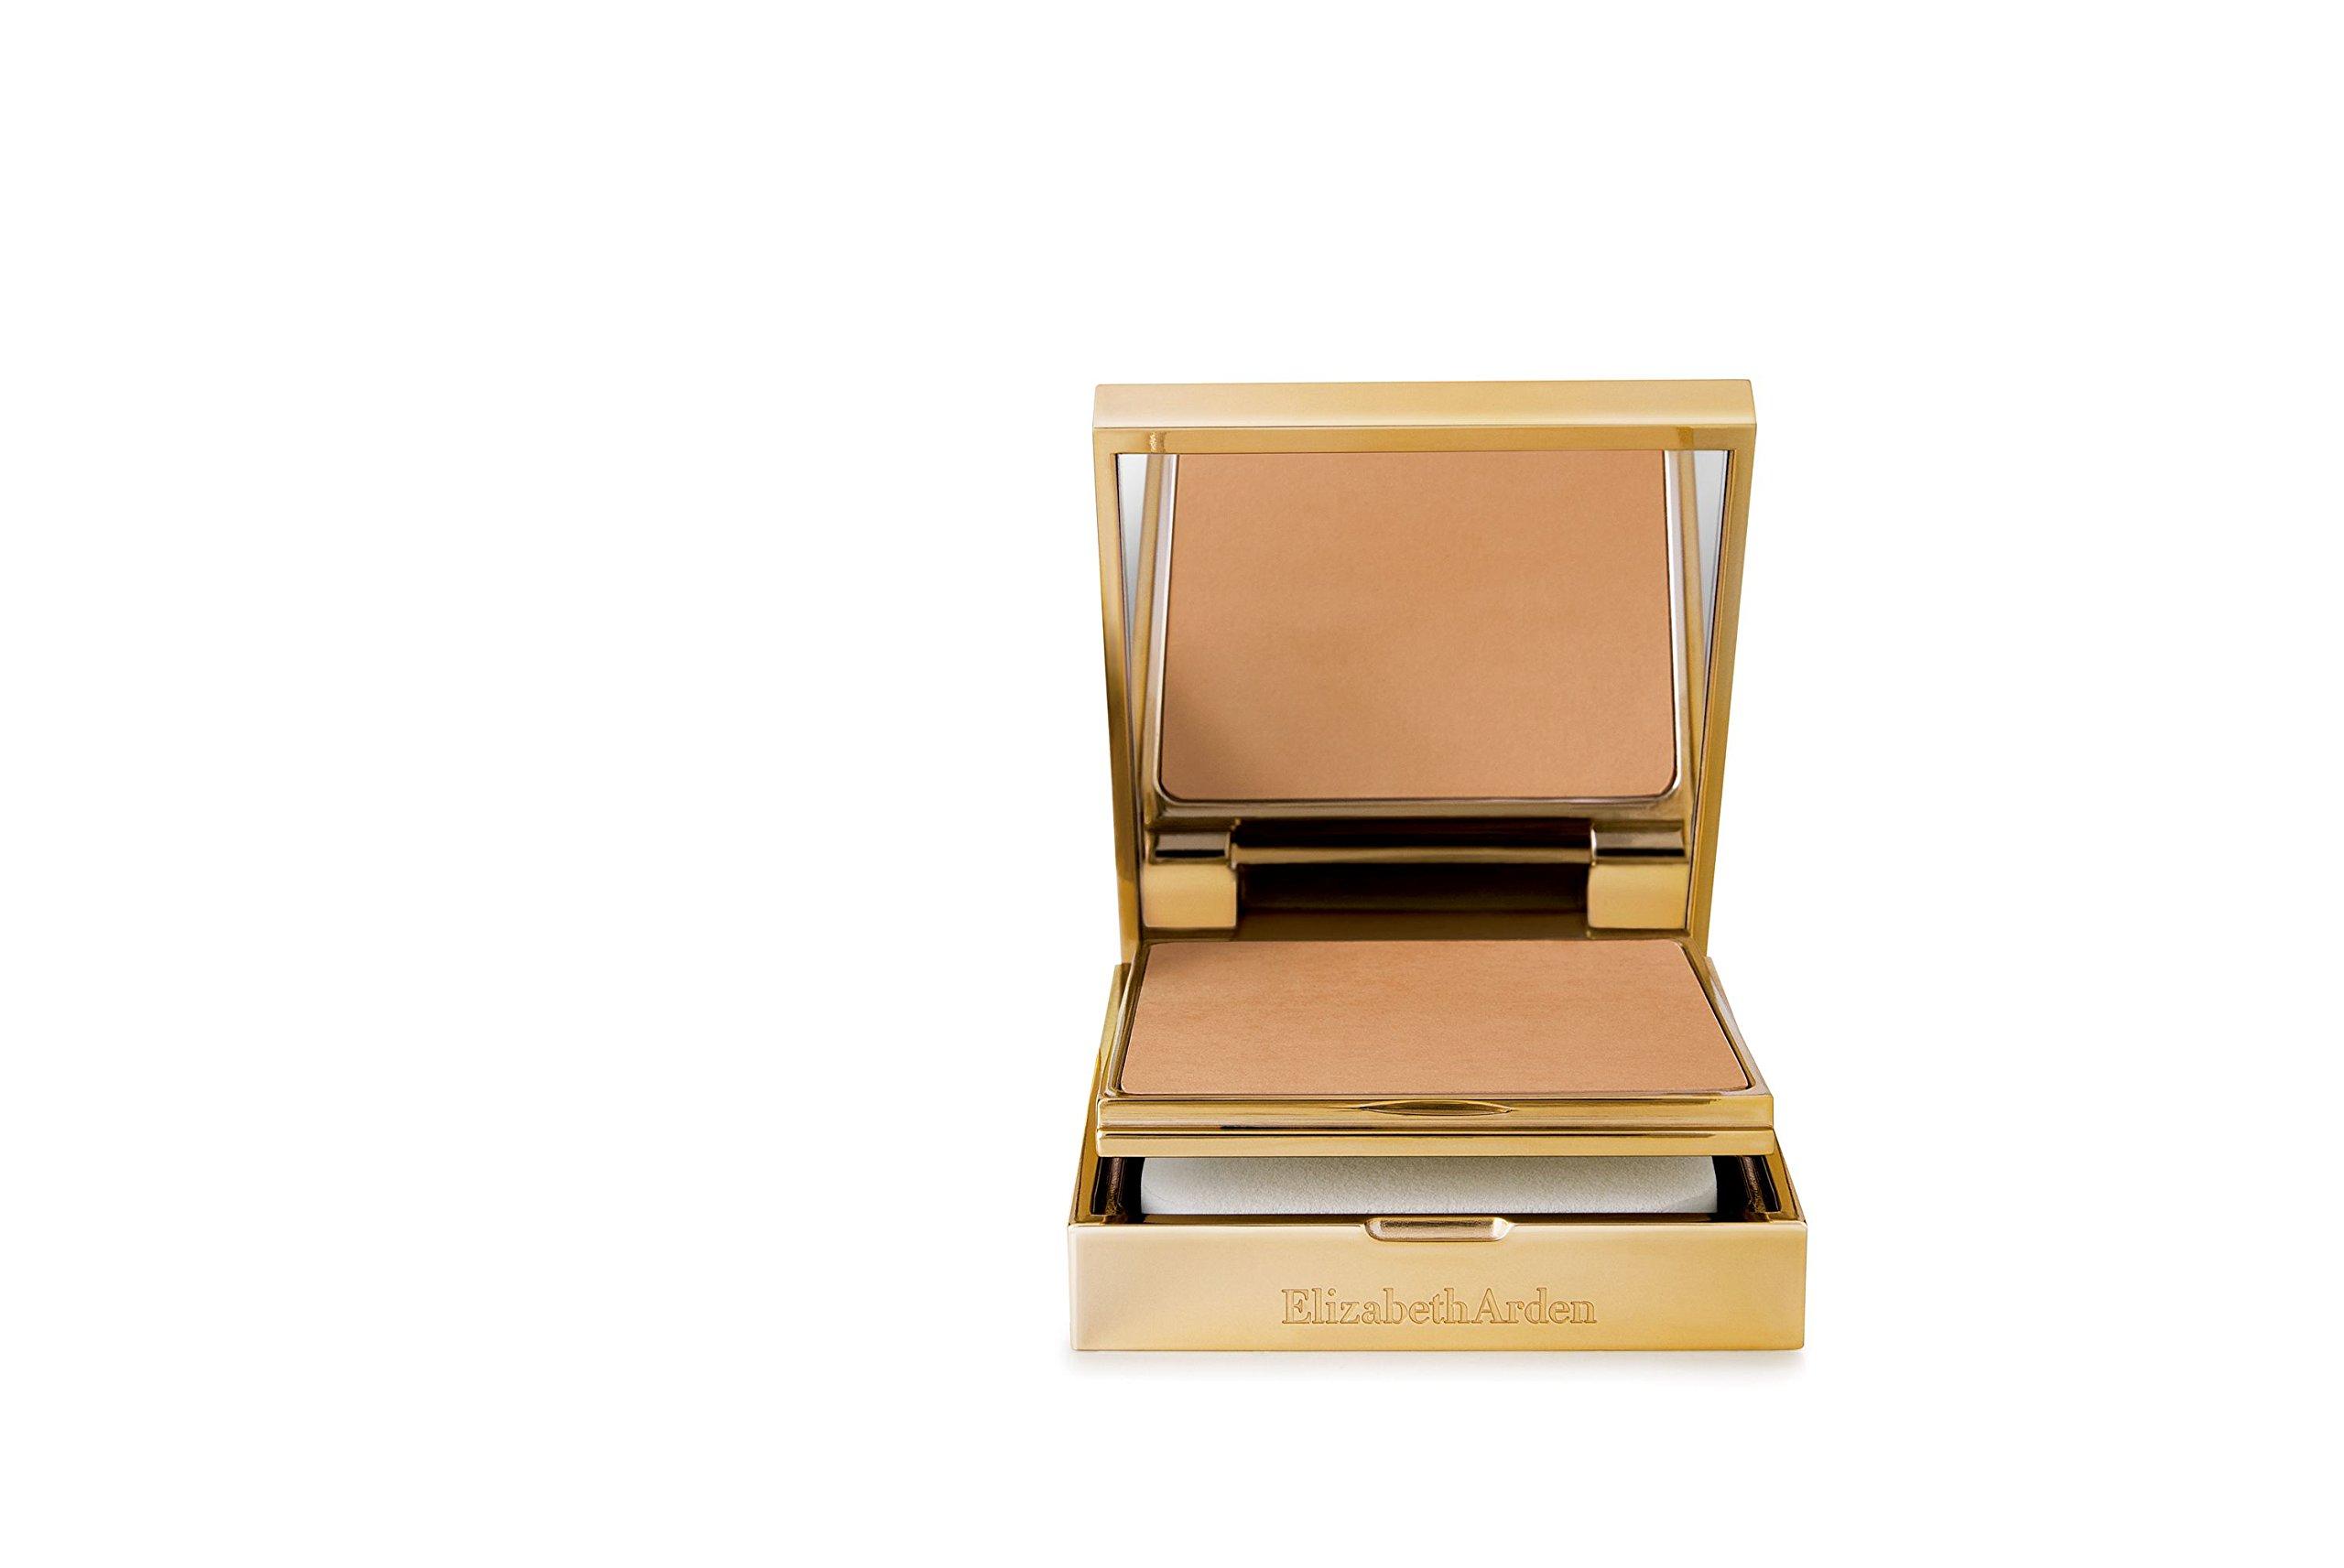 Elizabeth Arden Flawless Finish Sponge-On Cream Makeup, Toasty Beige.8 oz.